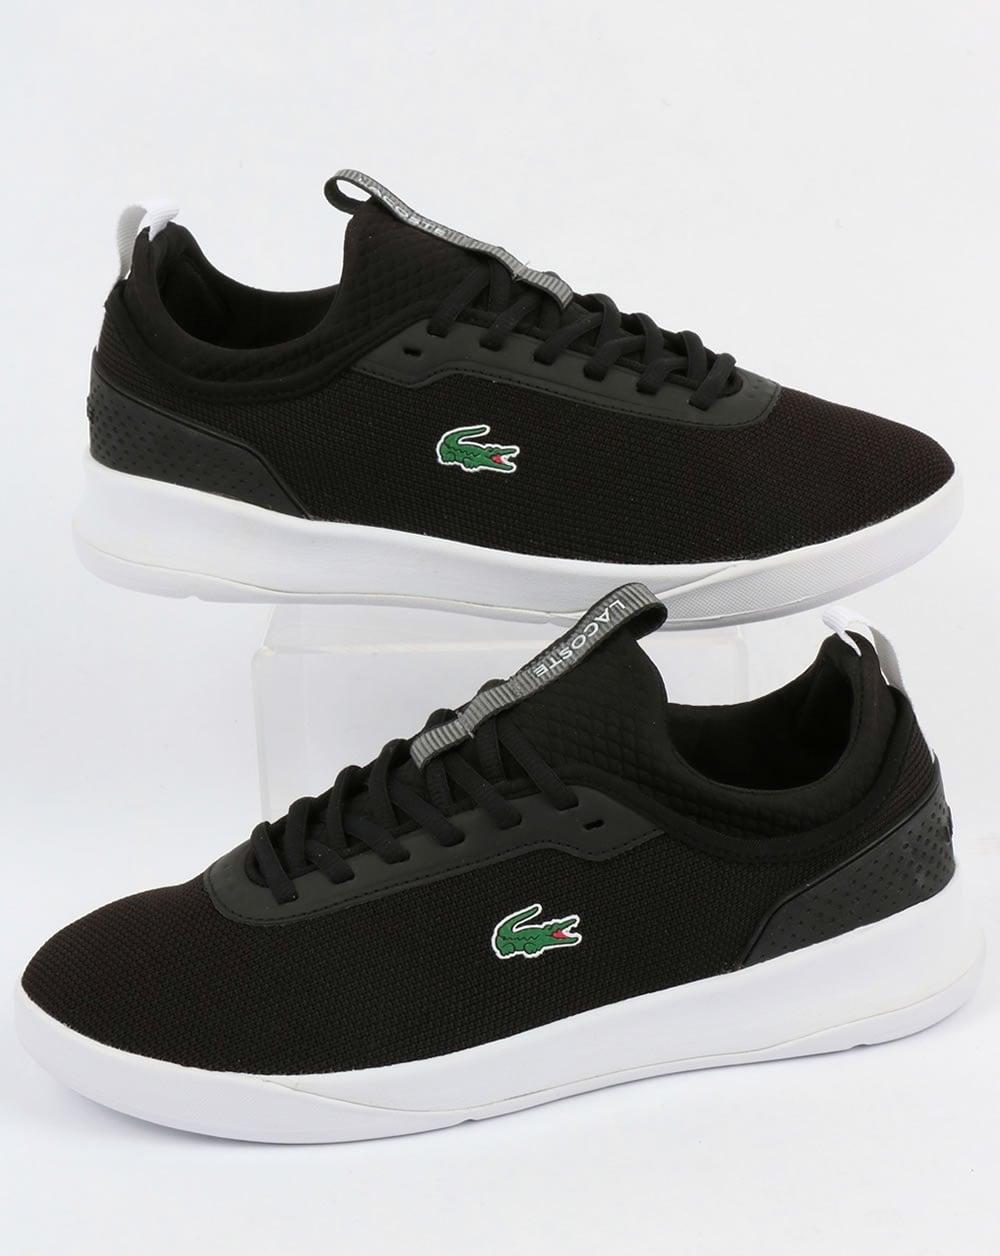 3eaadb035 Lacoste Lacoste Footwear LT Spirit 2.0 Trainers Black White